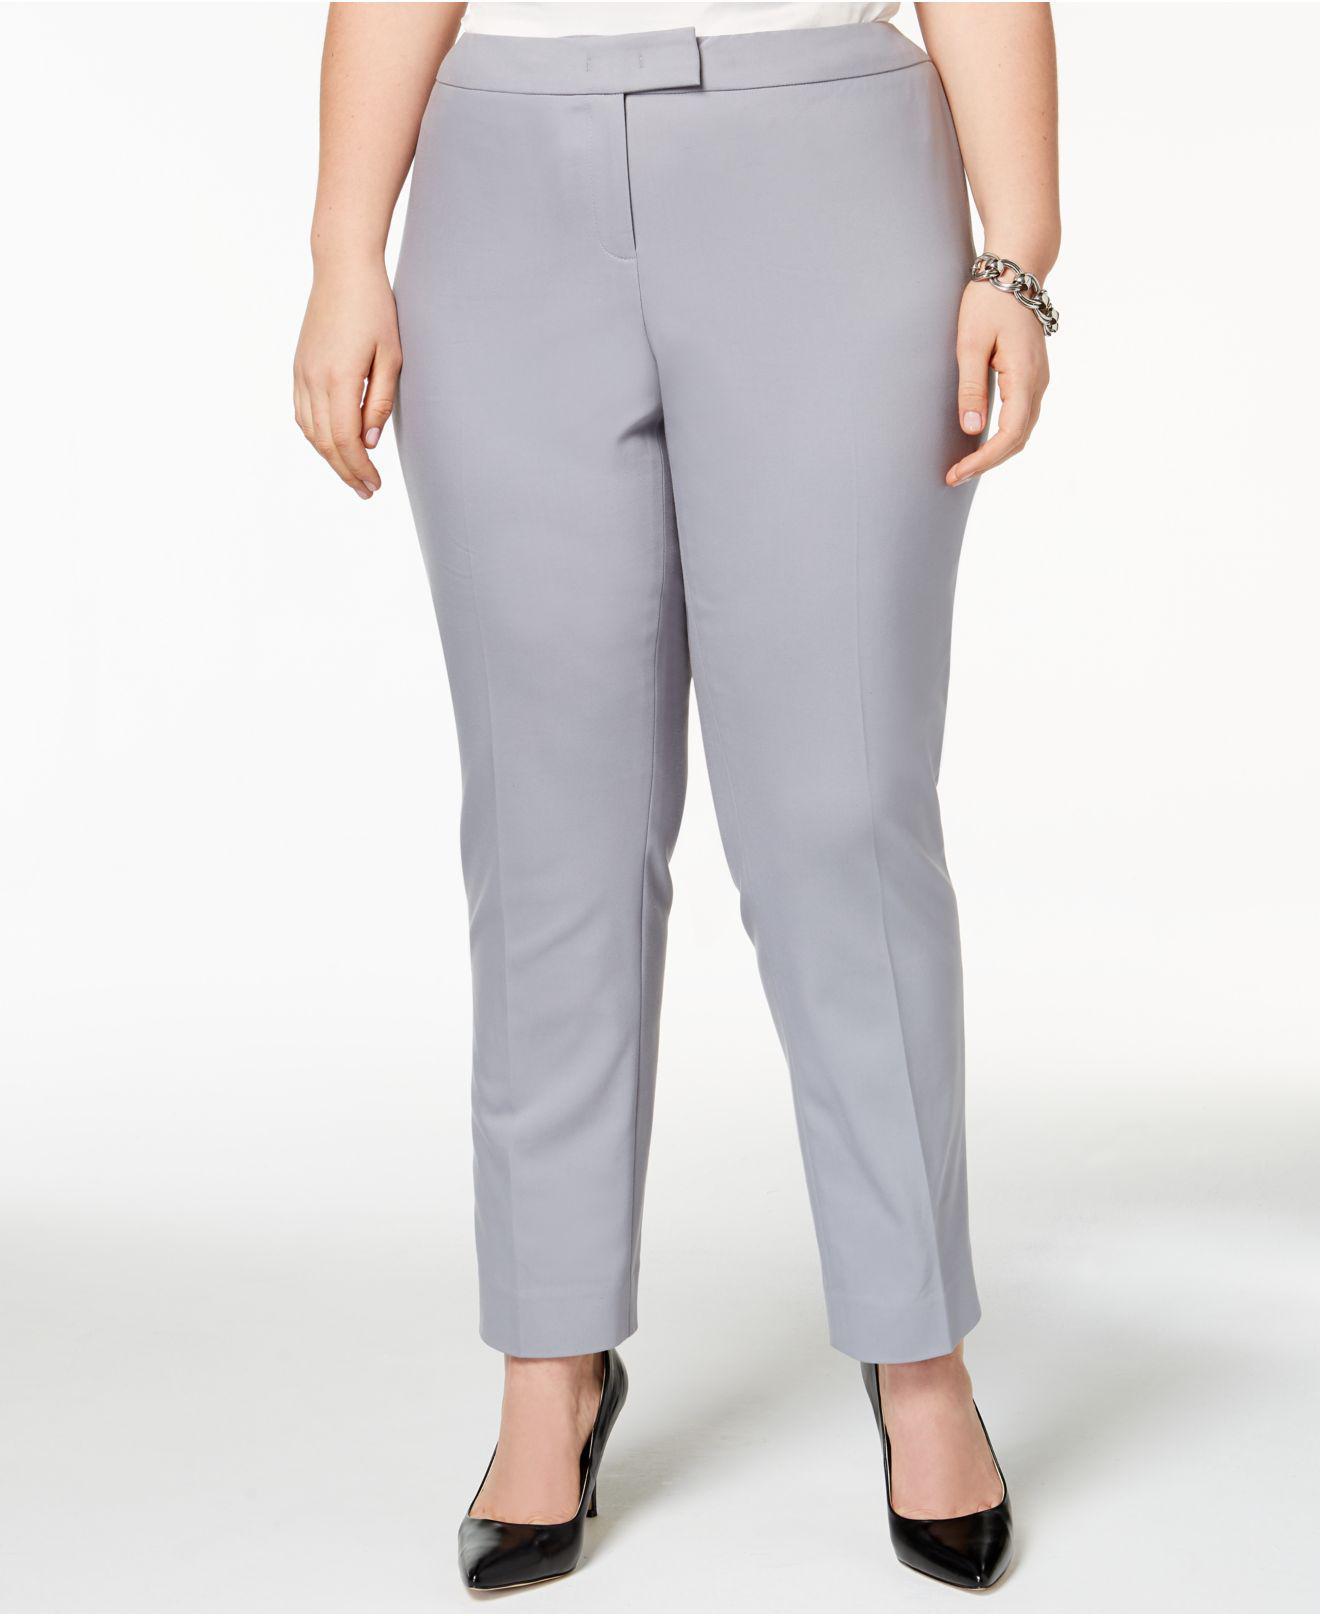 0779936c437 anne klein pants plus size Lyst - Anne Klein Plus Size Straight-leg Pants  in Gray - Save .